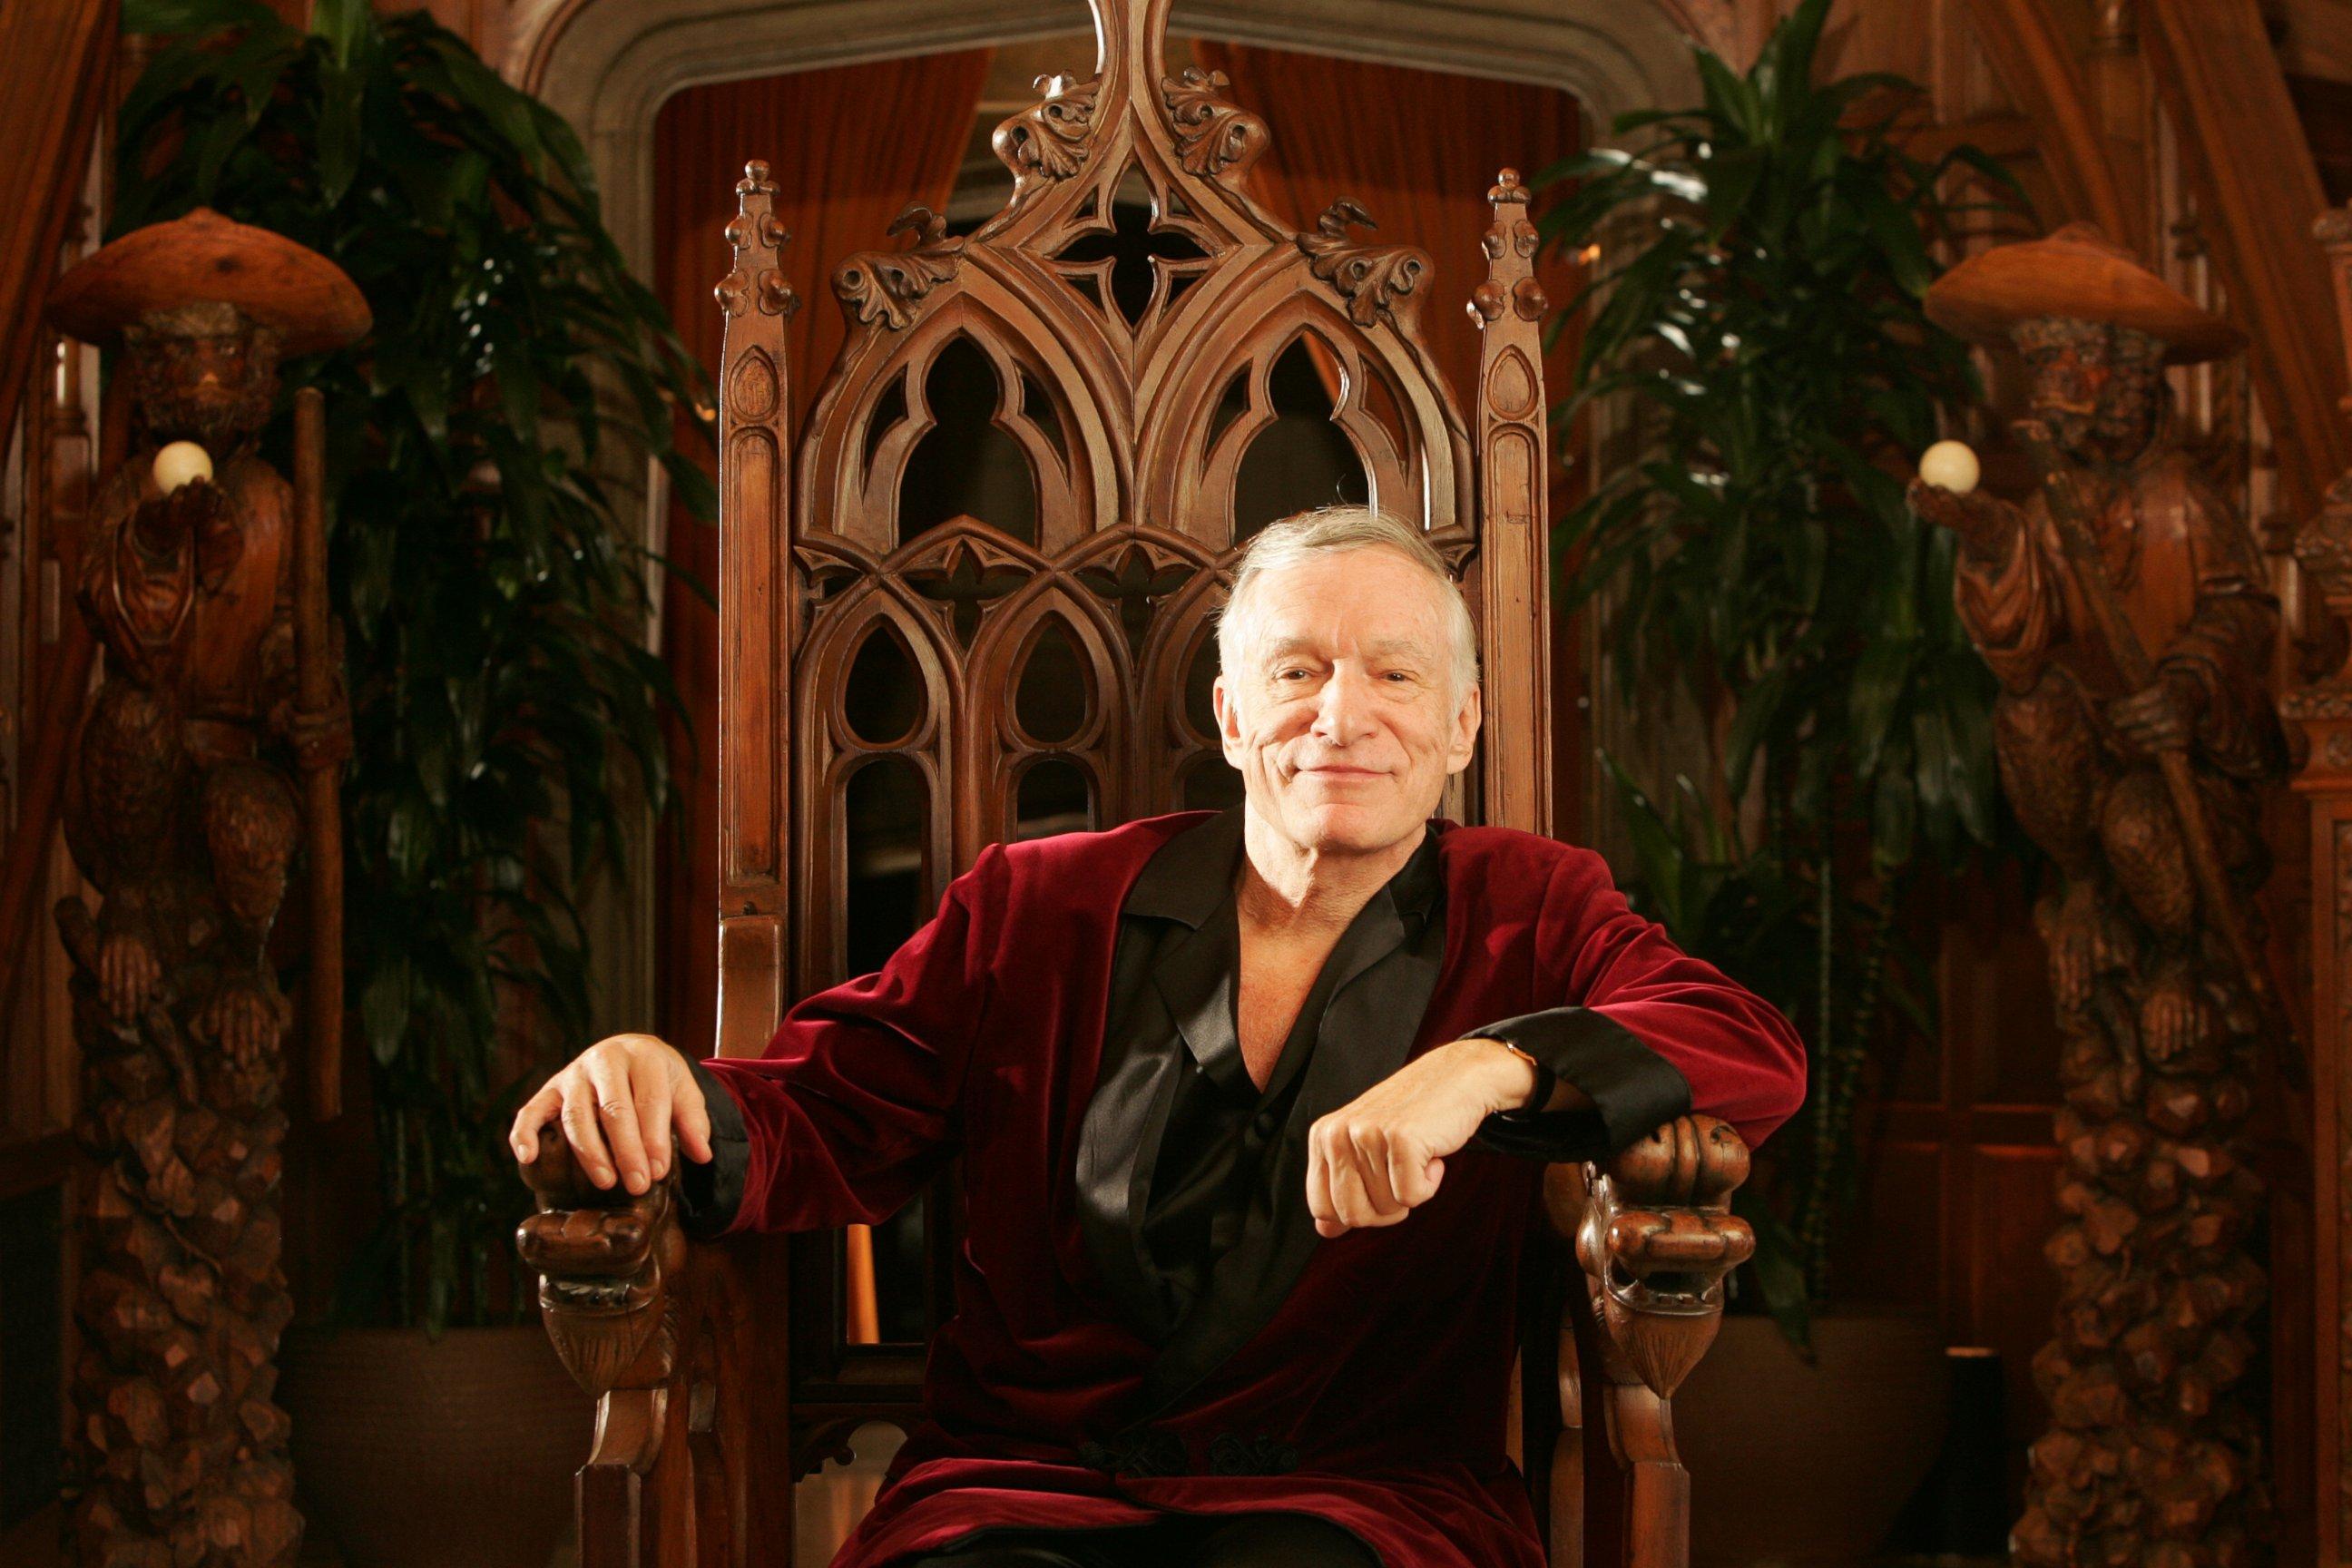 Playboy founder Hugh Hefner is dead